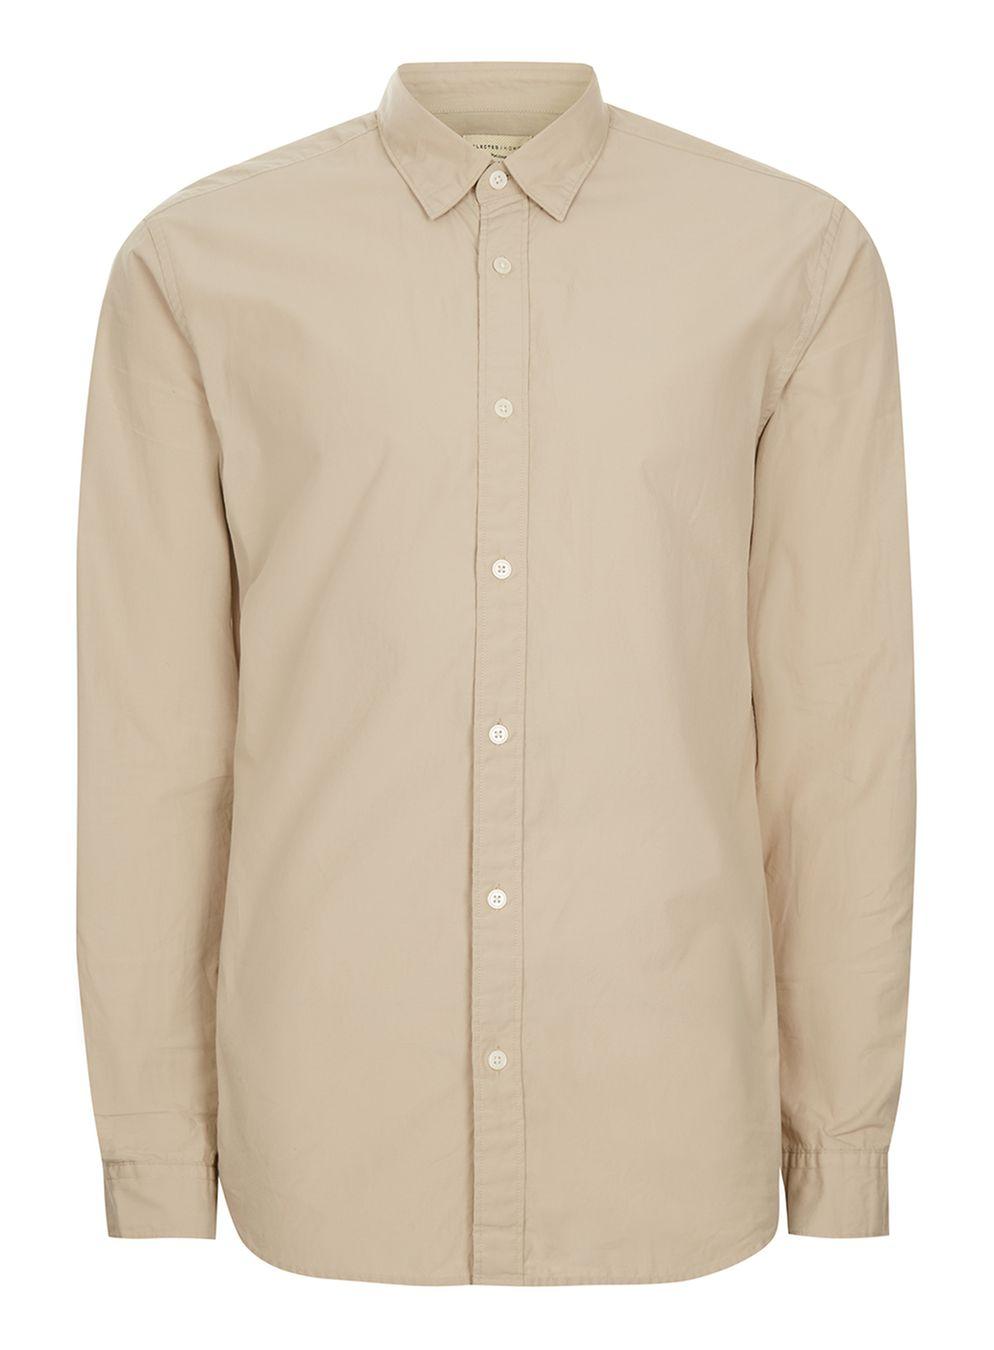 Cream Shirt Topman